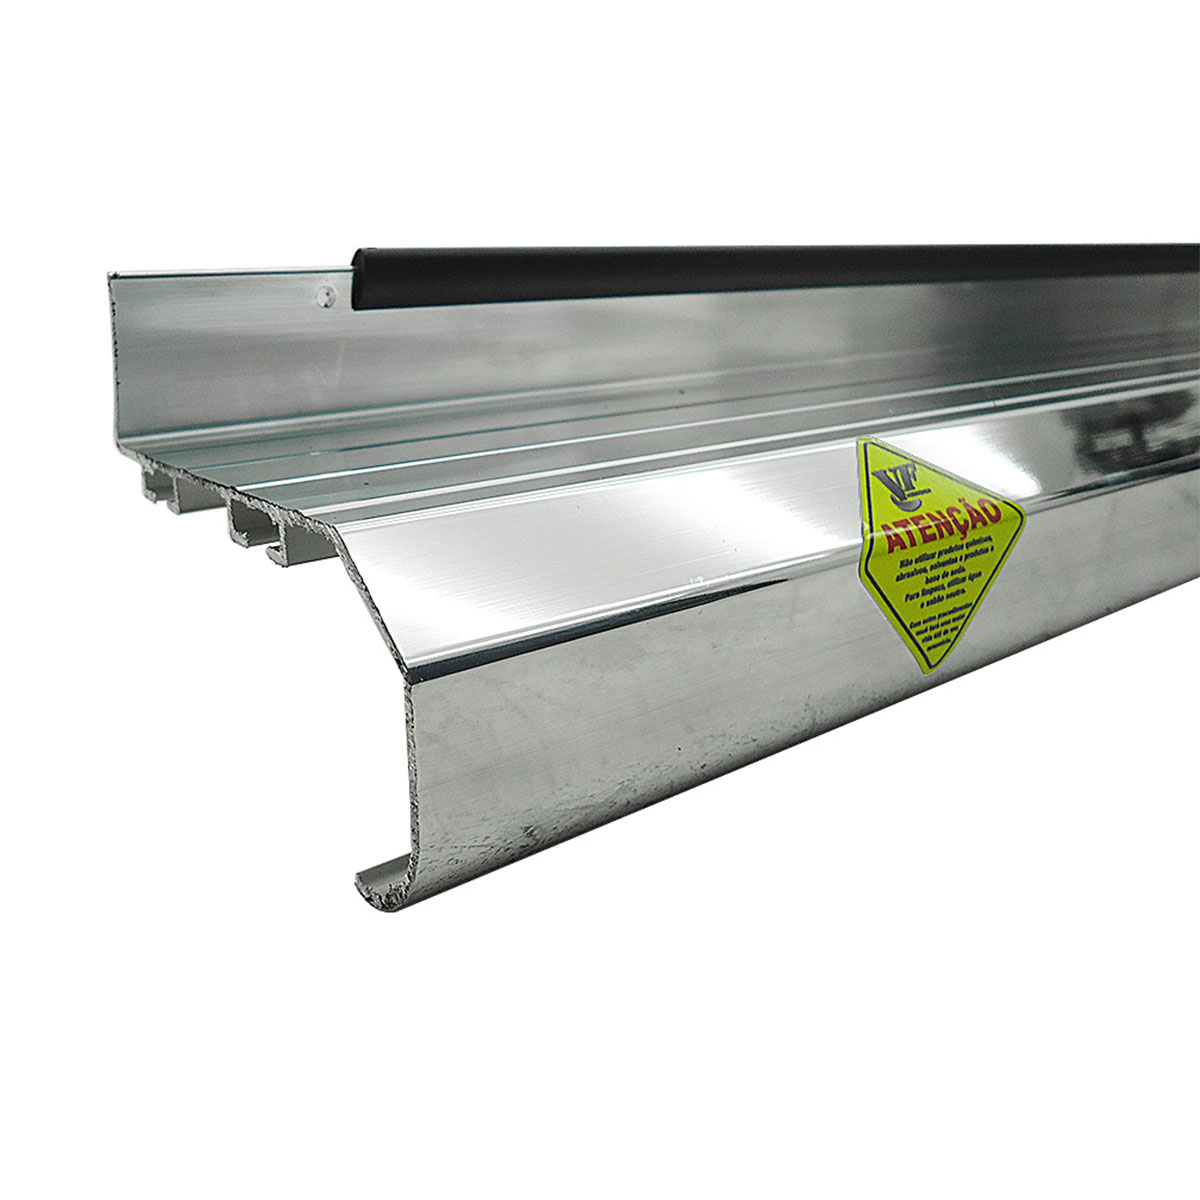 Estribo plataforma alumínio L200 Triton 2008 a 2017